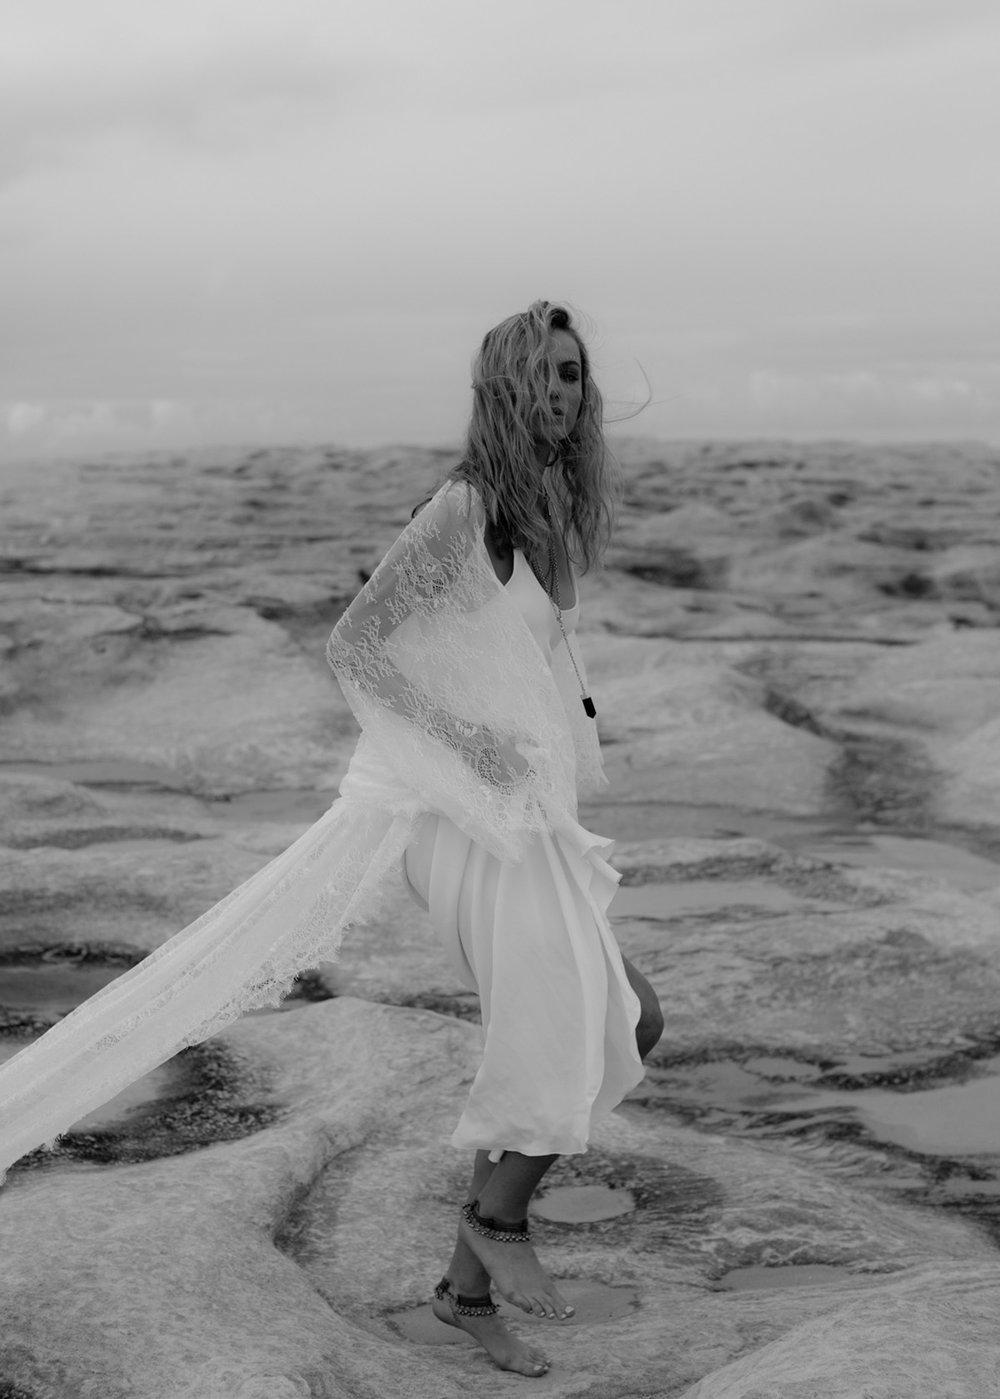 Windswept-3.jpg